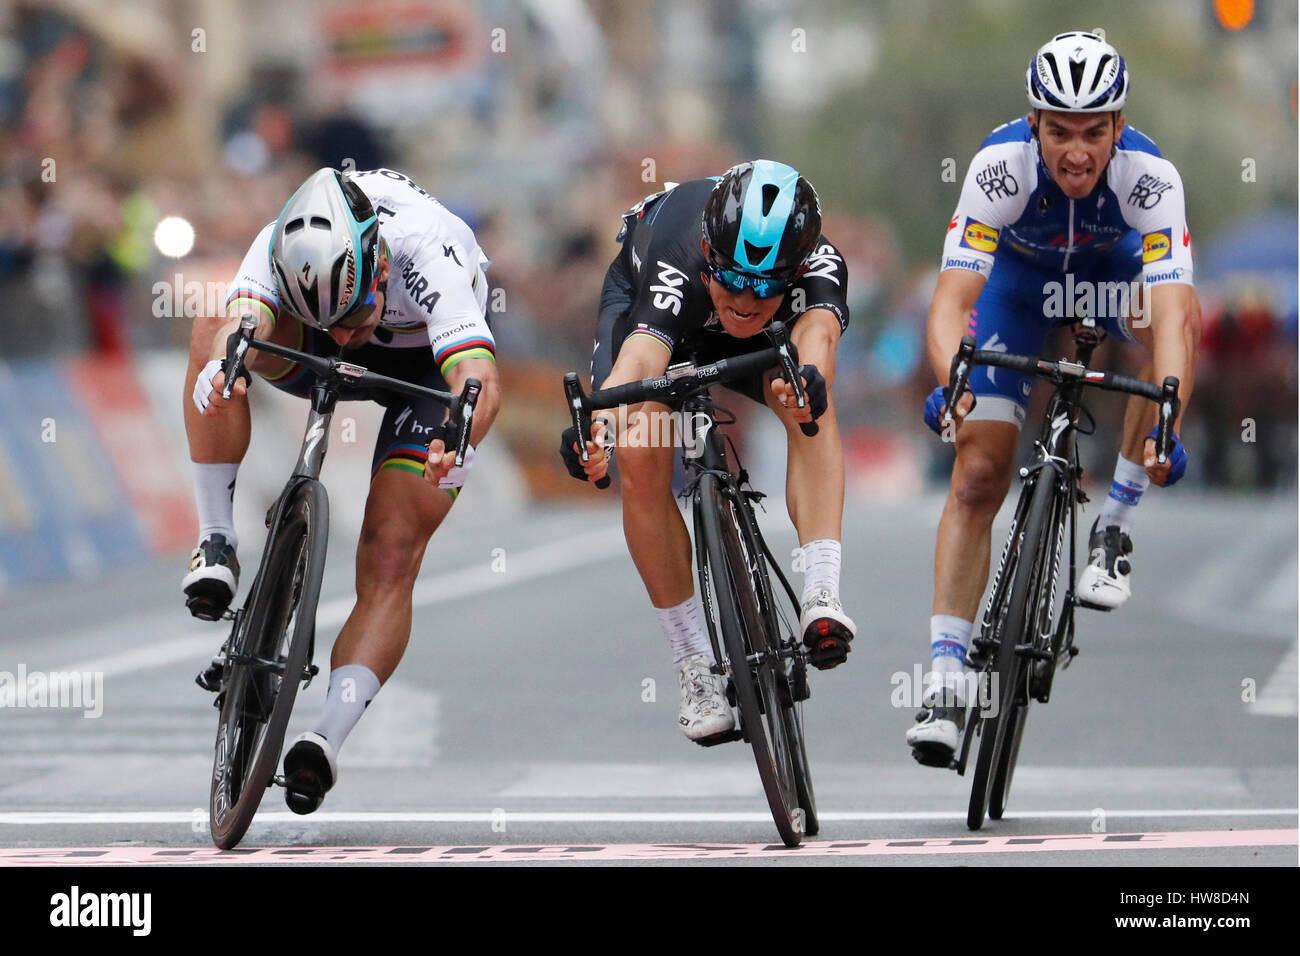 18 März 2017 108. Milano - Sanremo 1.: Michal KWIATKOWSKI (POL) Sky 2.: SAGAN Peter (SVK) Bora - Hansgrohe 3.: ALAPHILIPPE Stockfoto